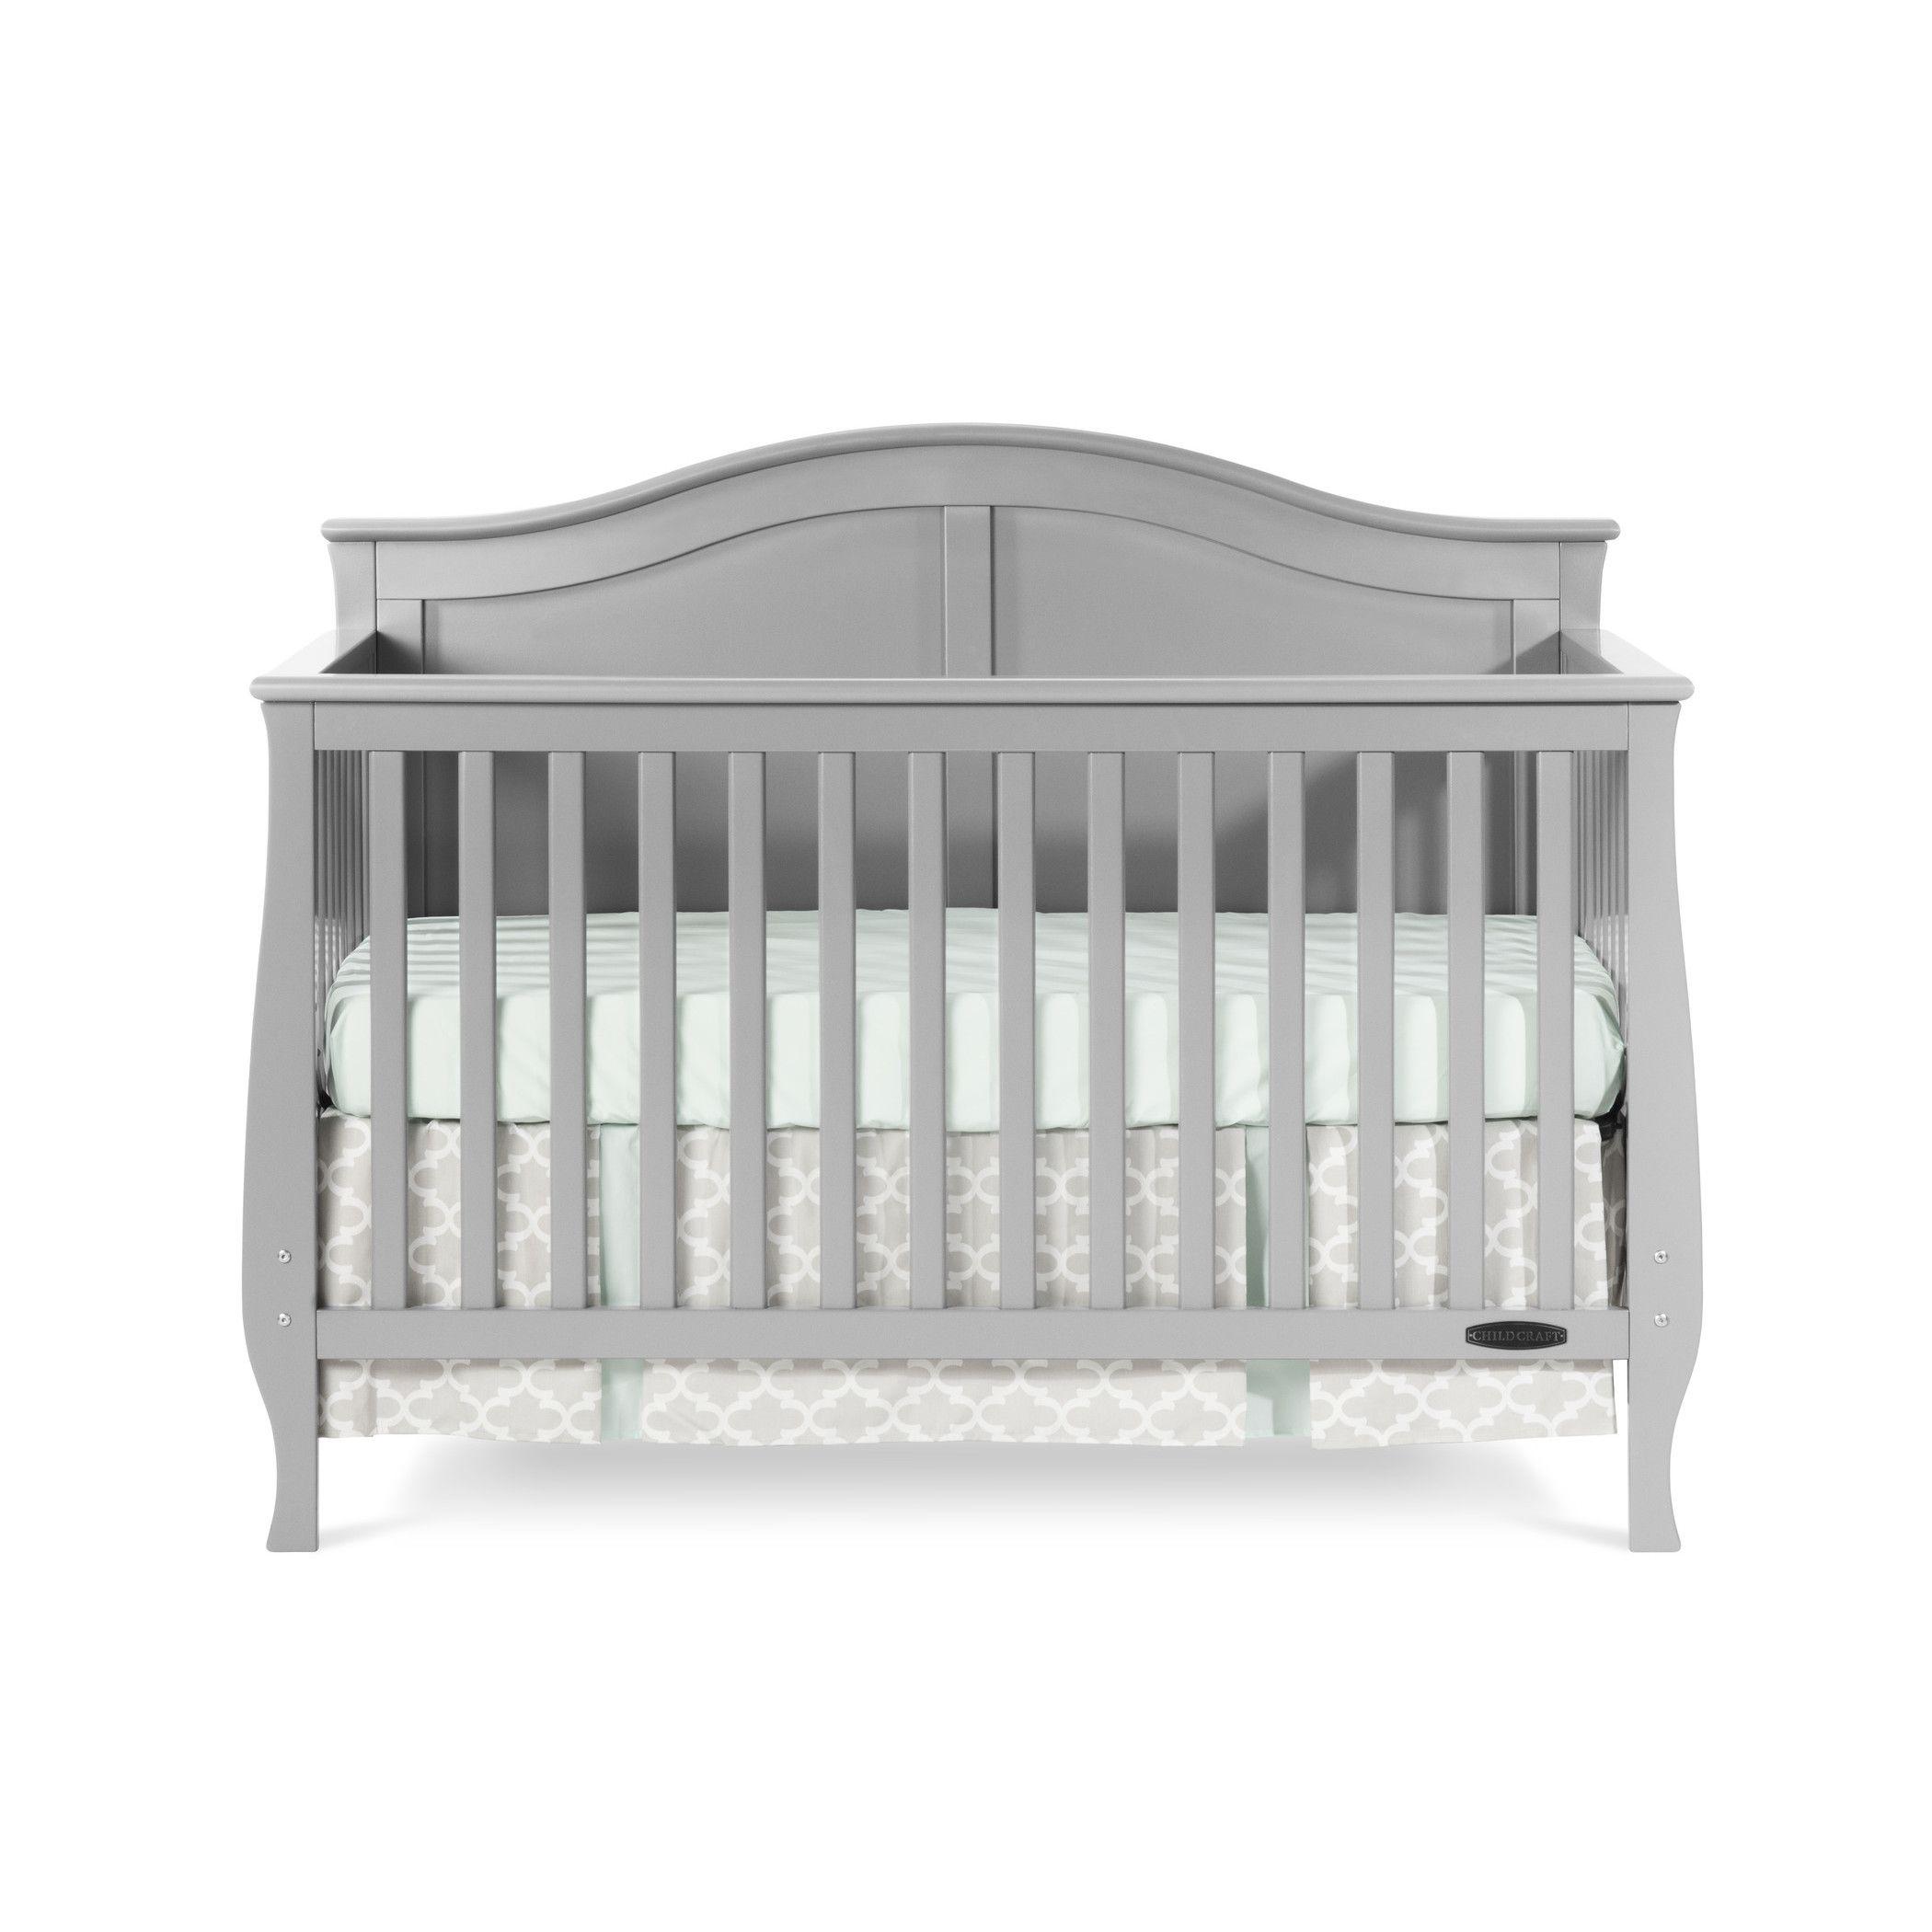 Child craft camden crib - You Ll Love The Camden 4 In 1 Convertible Crib At Wayfair